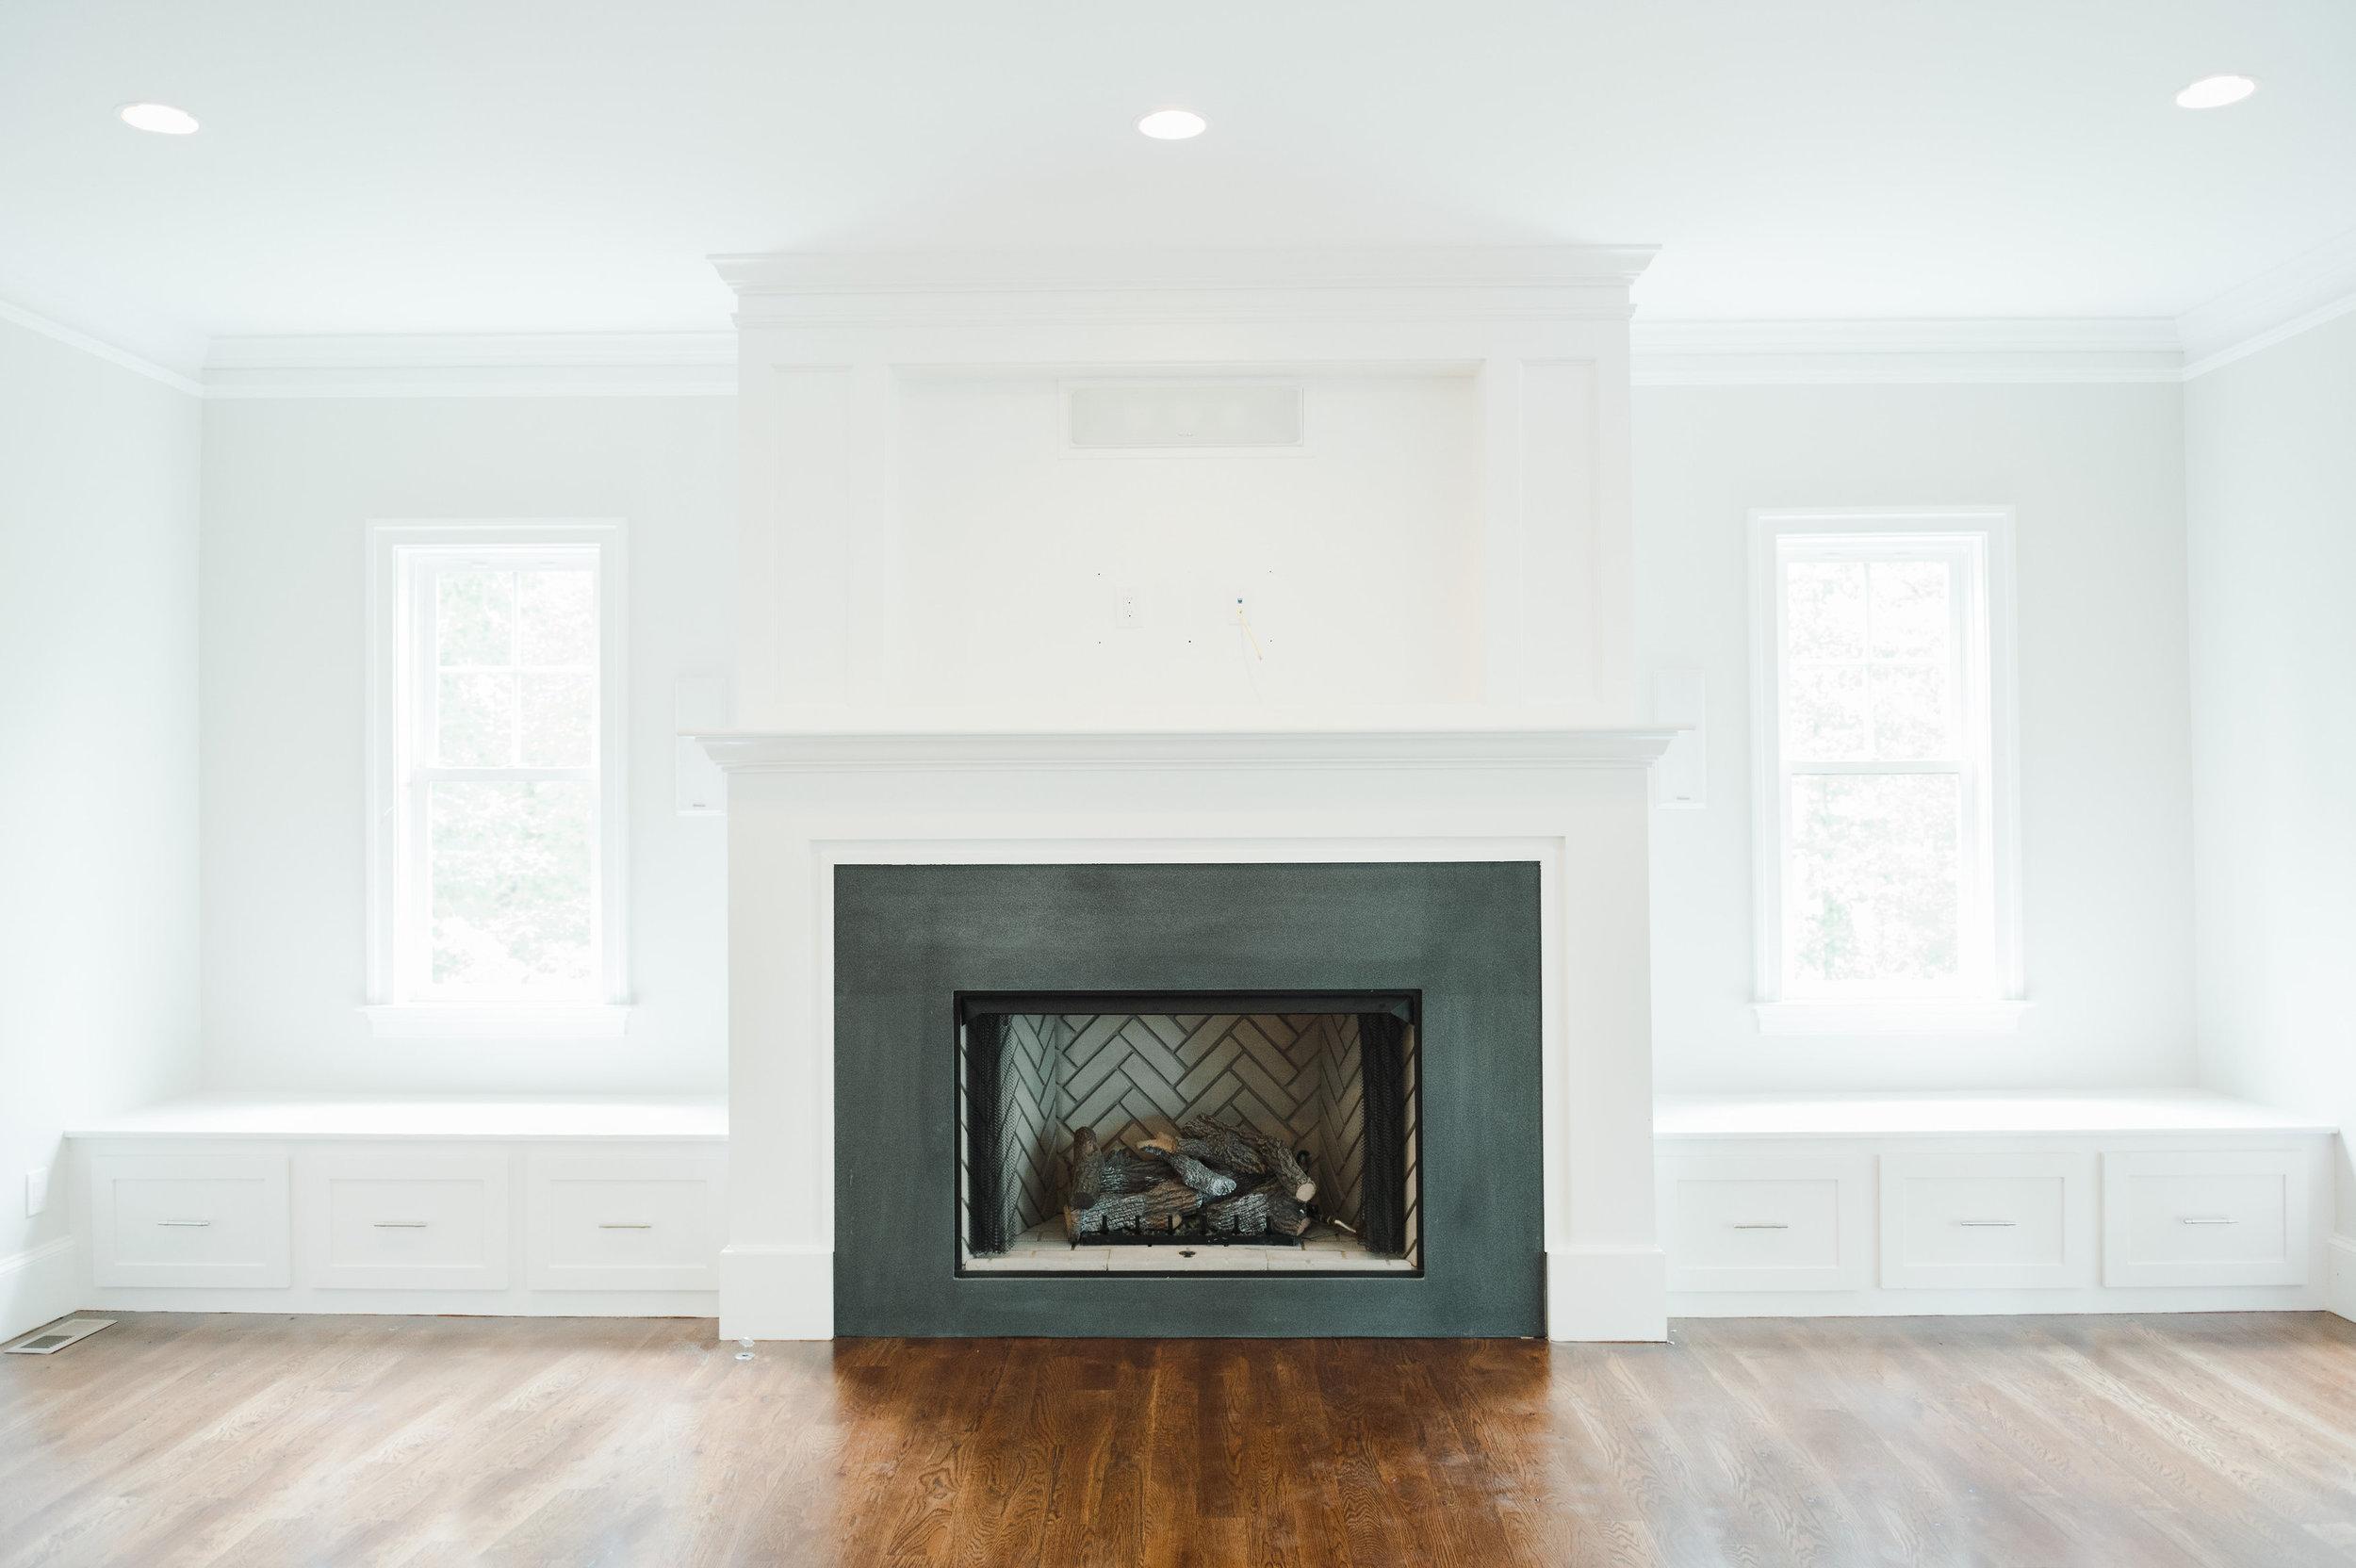 Fireplace design with black honed granite and herringbone firebox || Studio McGee